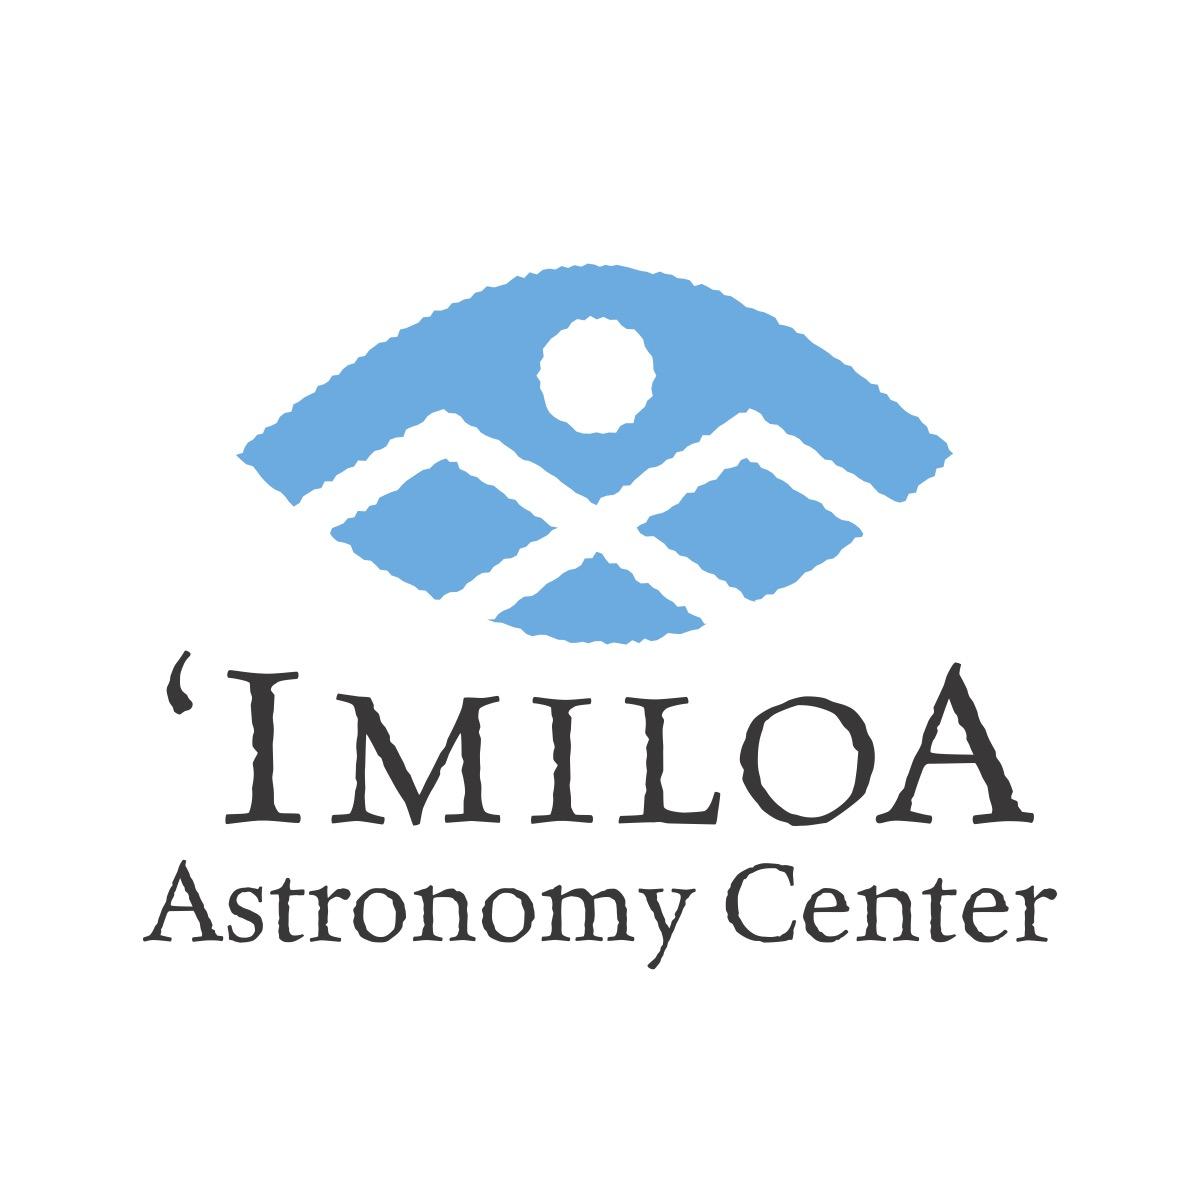 Imiloa Astronomy Center of Hawaii